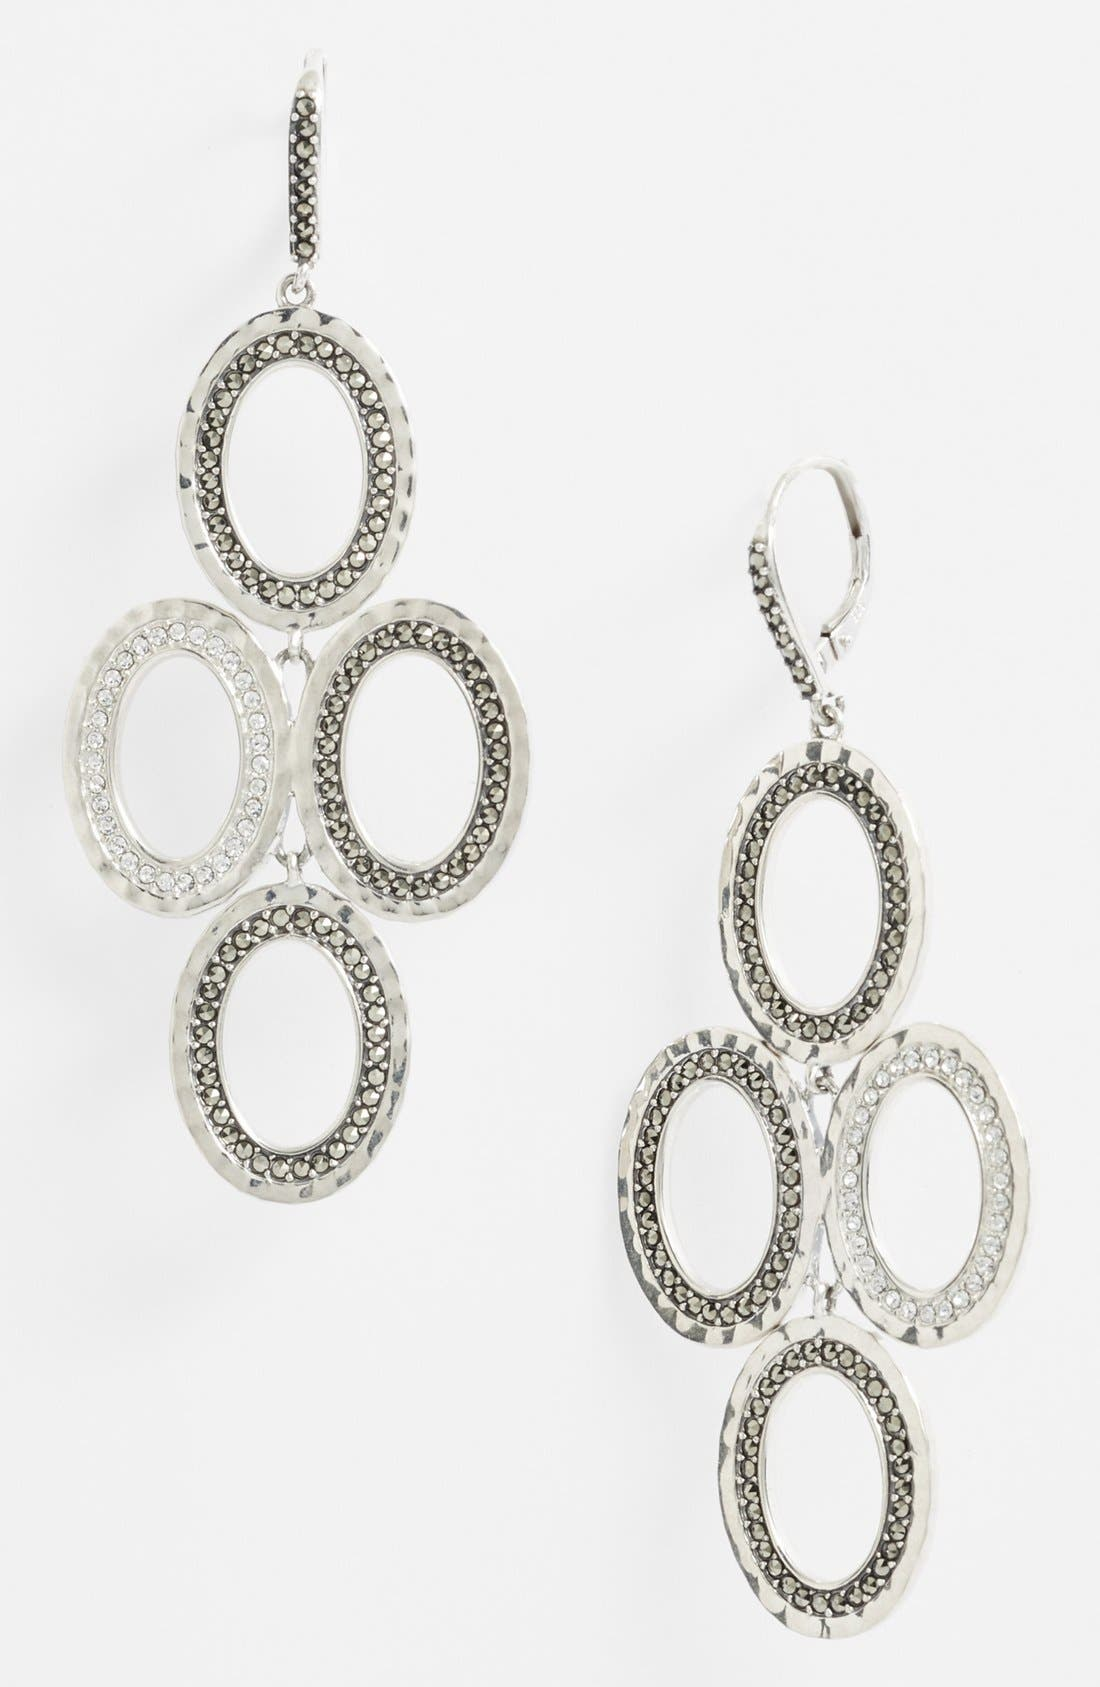 Main Image - Judith Jack 'Halo' Oval Chandelier Earrings